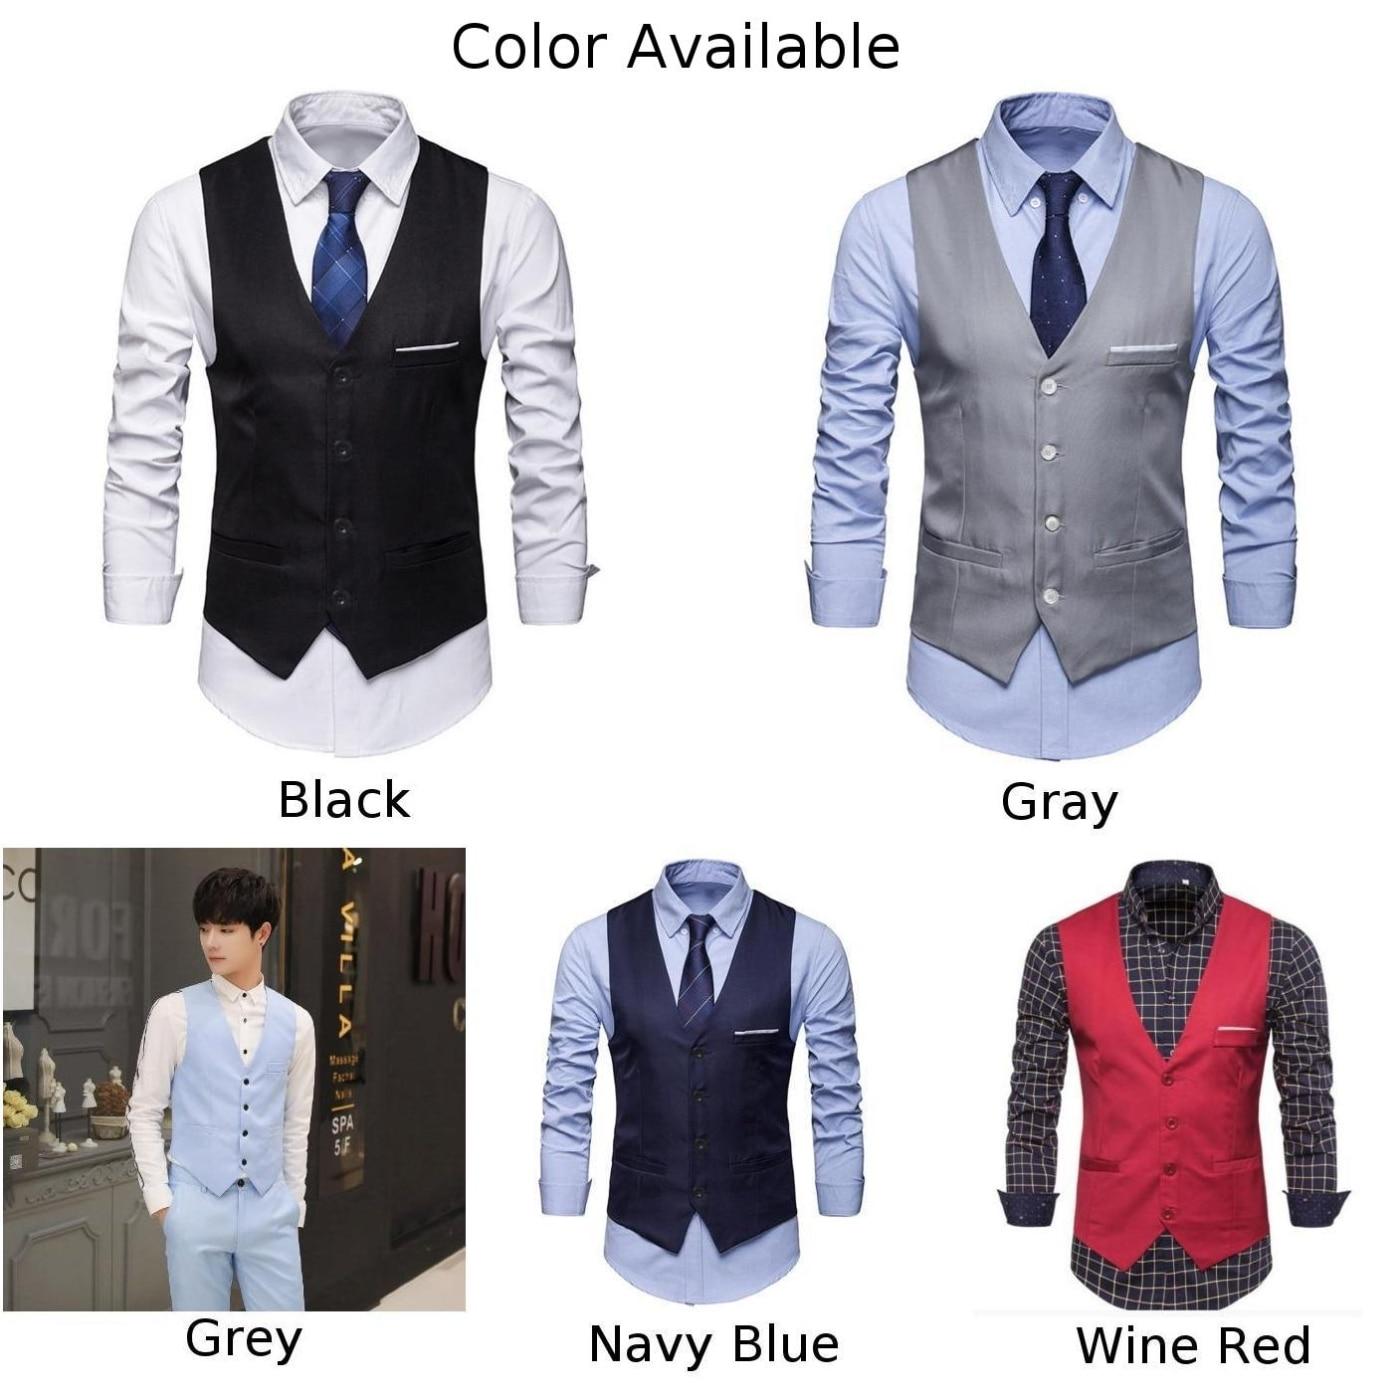 Men's Black Colour Wedding Suit Vests For Men Slim Fit Dress Vest Male Formal Tuxedo Waistcoat Business Casual Sleeveless Jacket